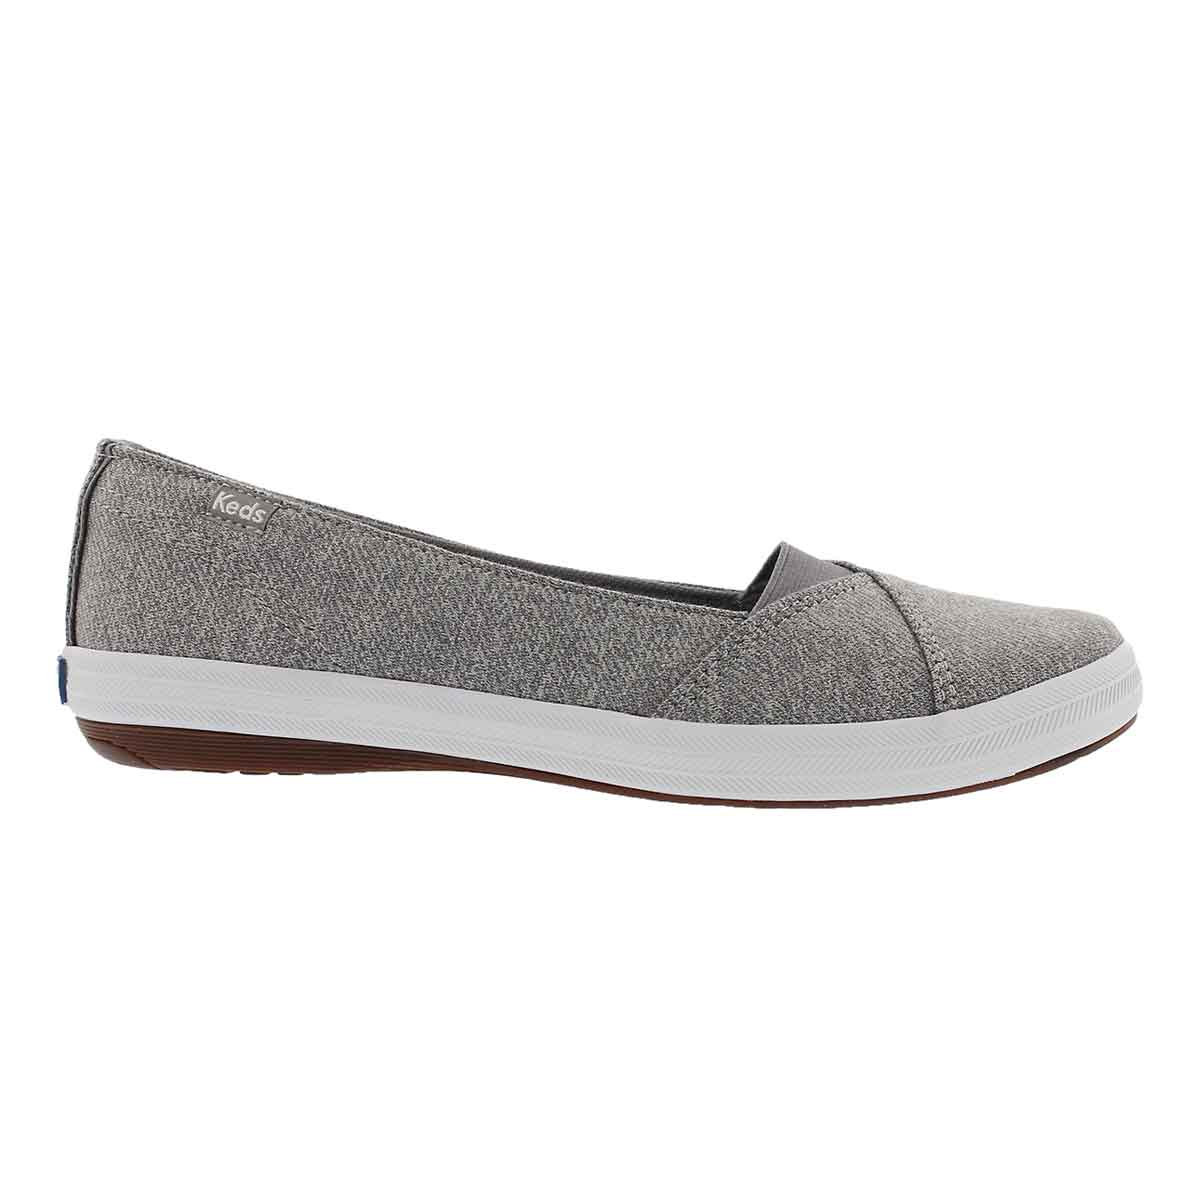 Lds Cali II Studio grey casual slip on